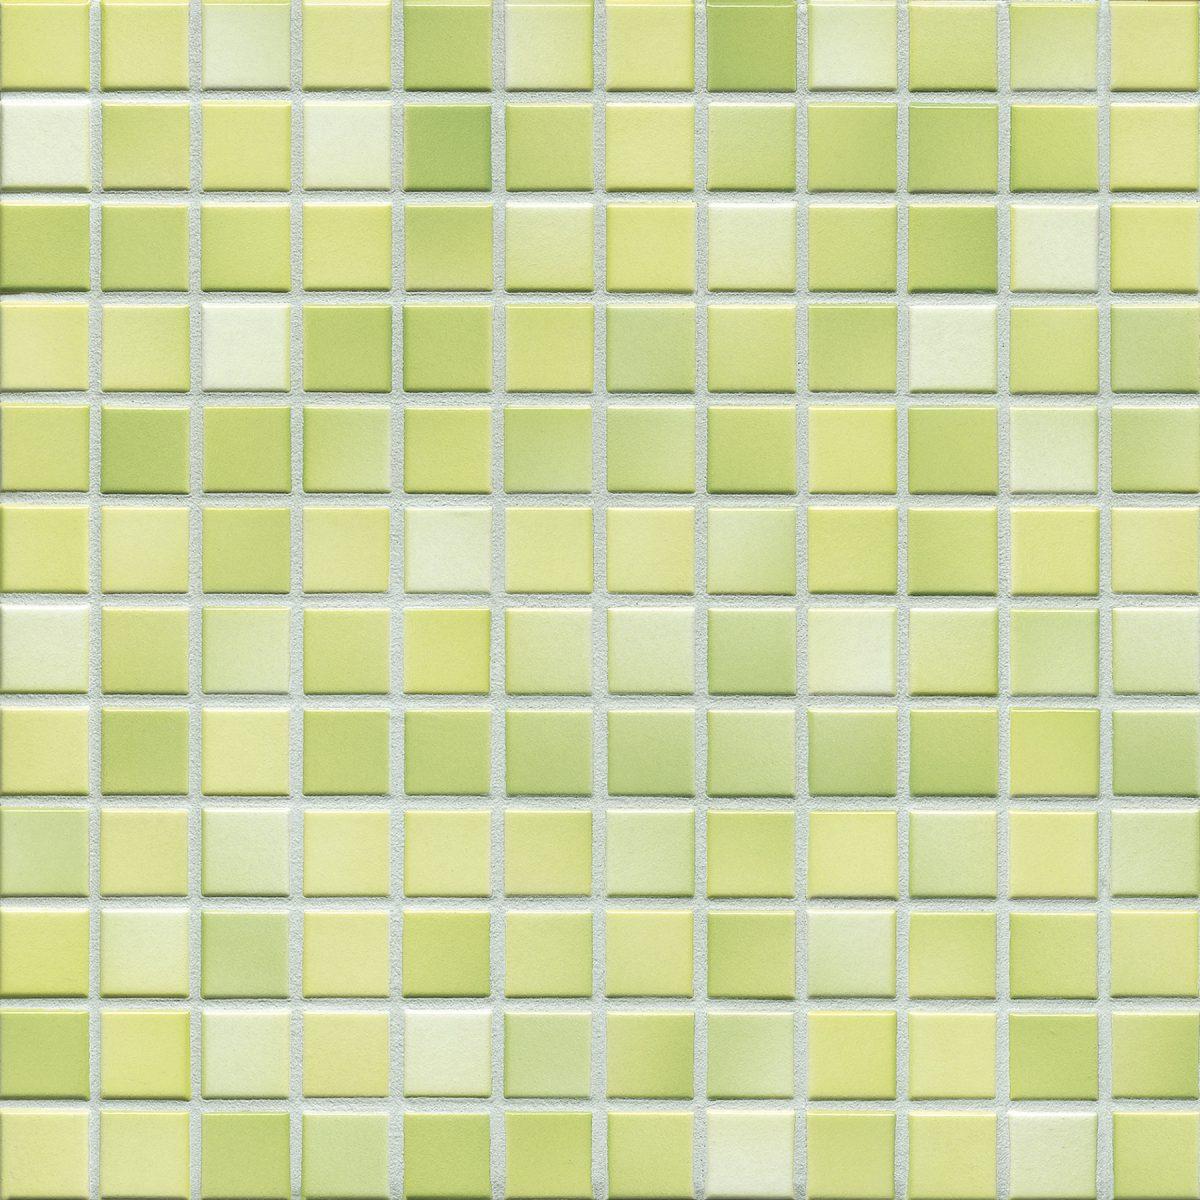 Мозаика серия Fresh 2,4 X 2,4 см Lime Green Mix Glossy (глазурованная)